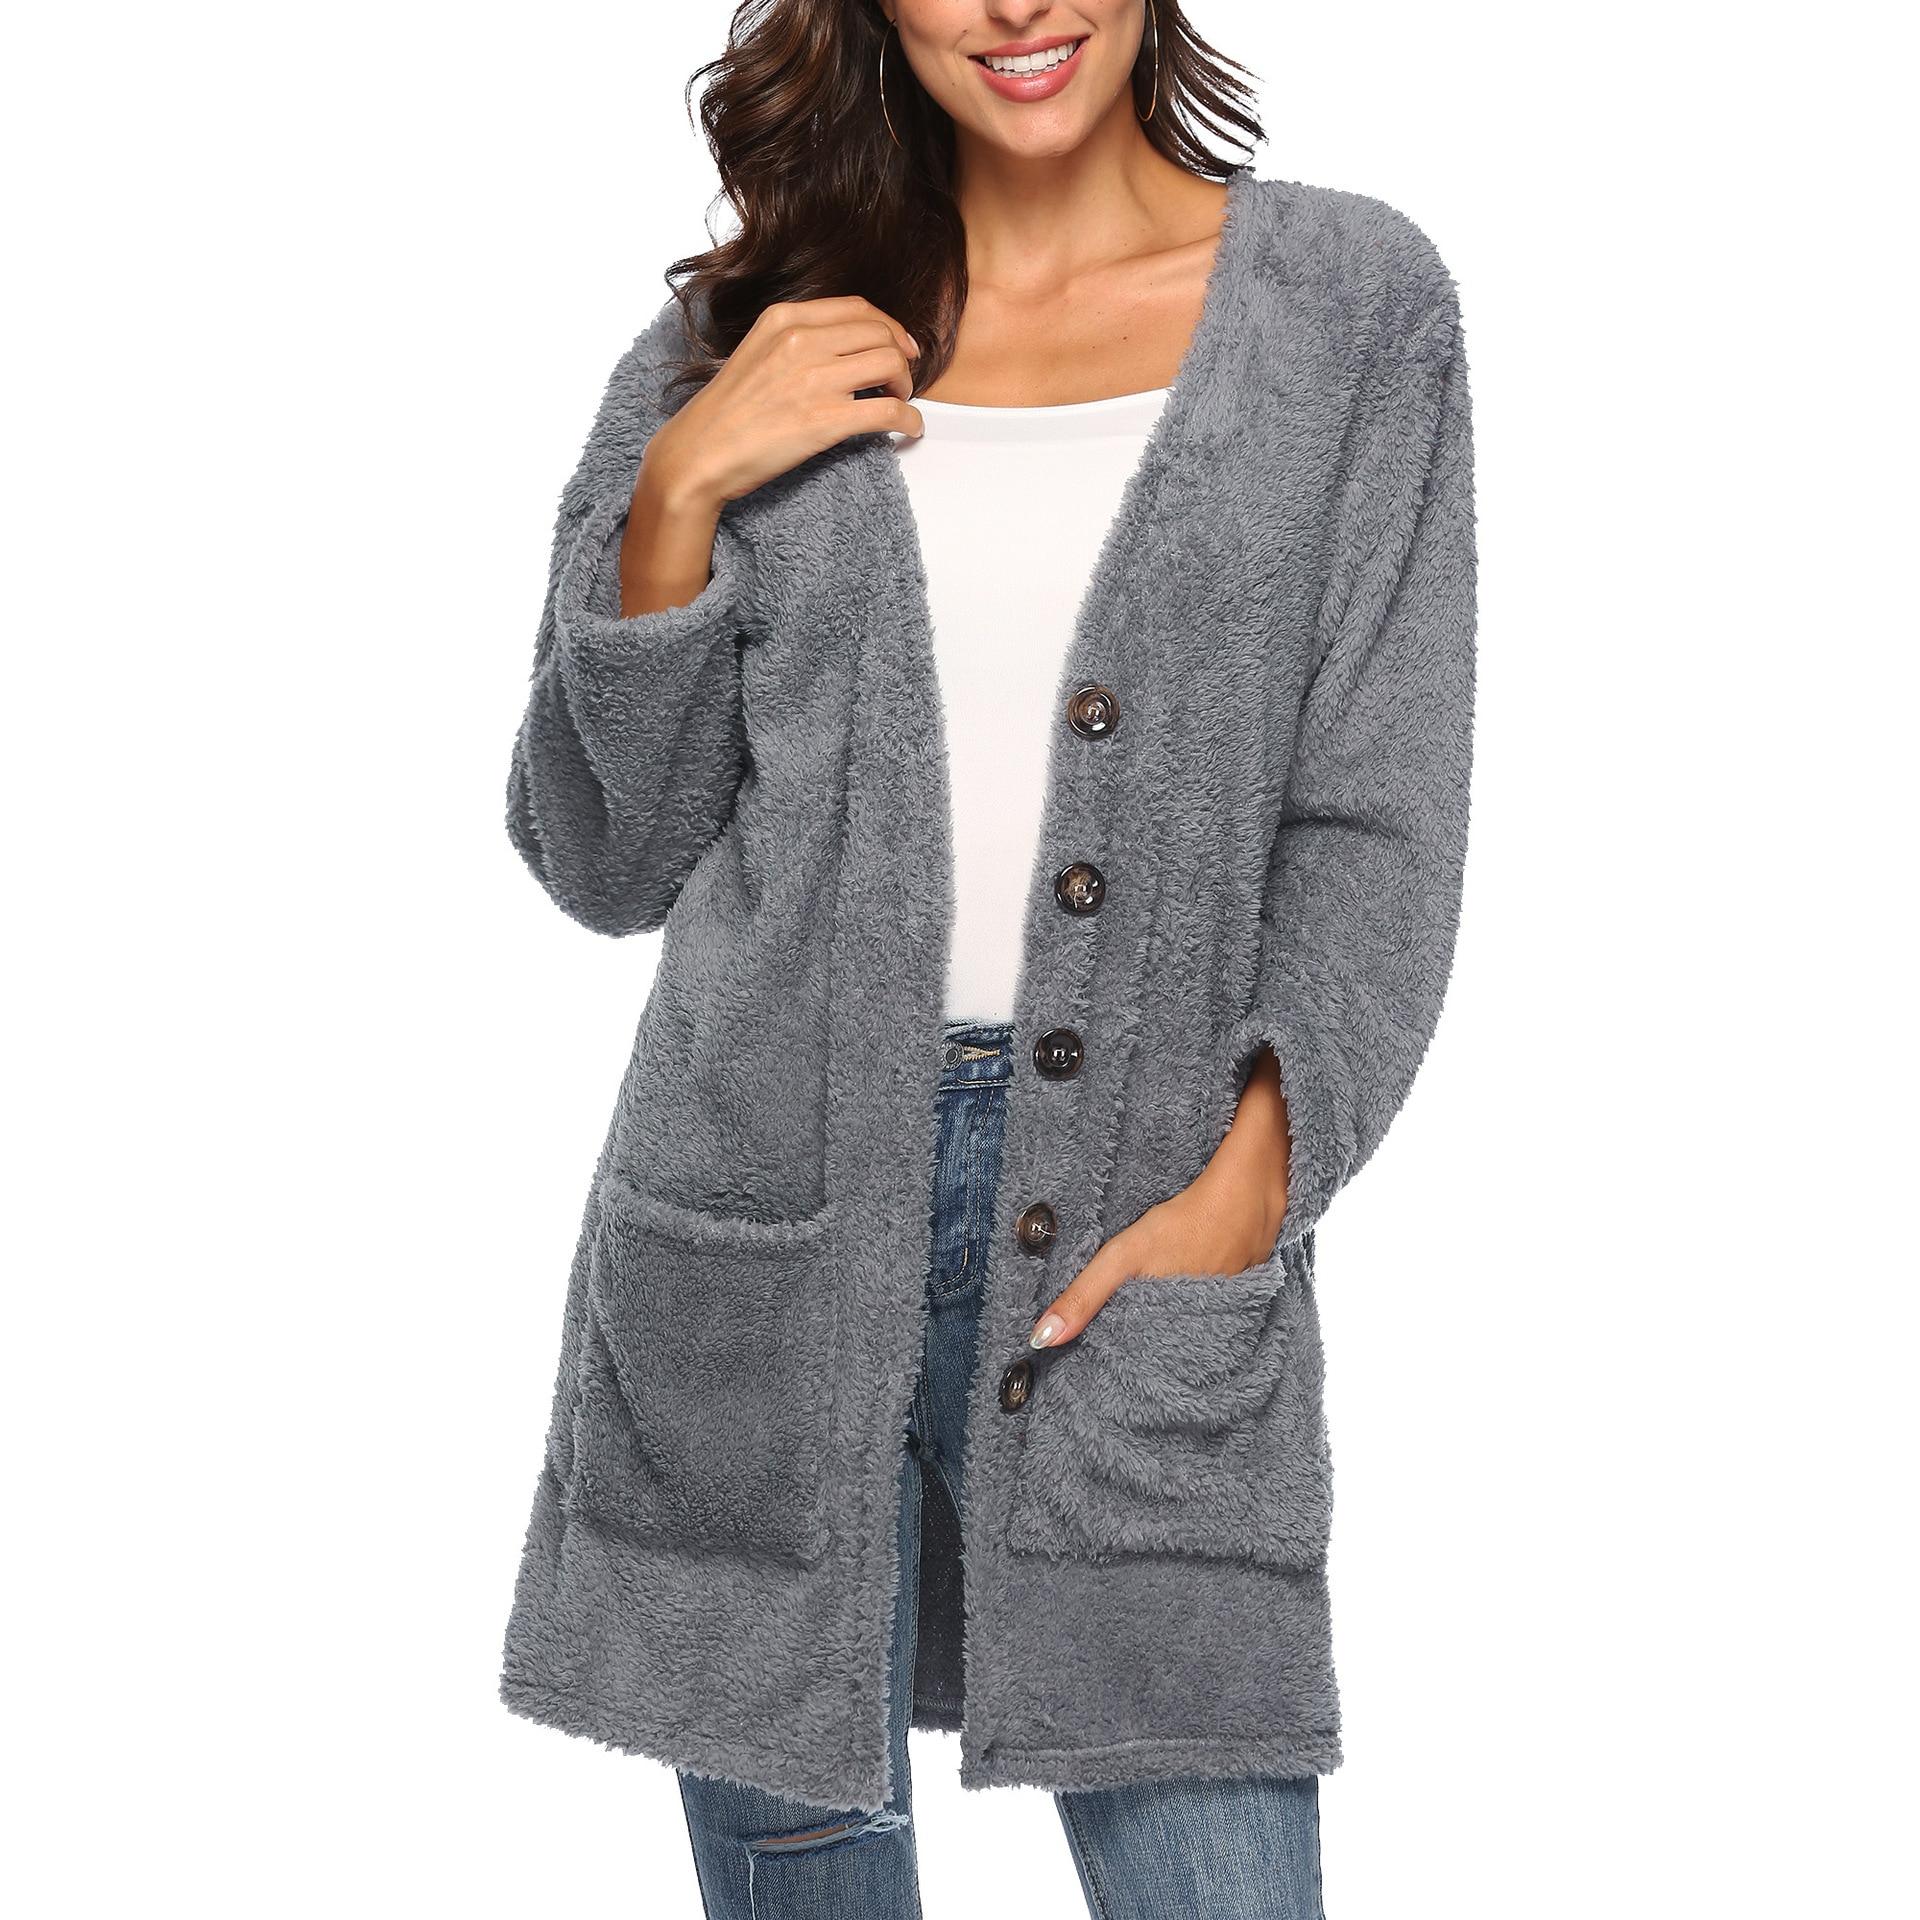 Plus Velvet Thick Fleece Sweater Women Winter Long Plash Cardigans Womens Sweater Jumper Pull Femme Outerwear Sexy Cardigans